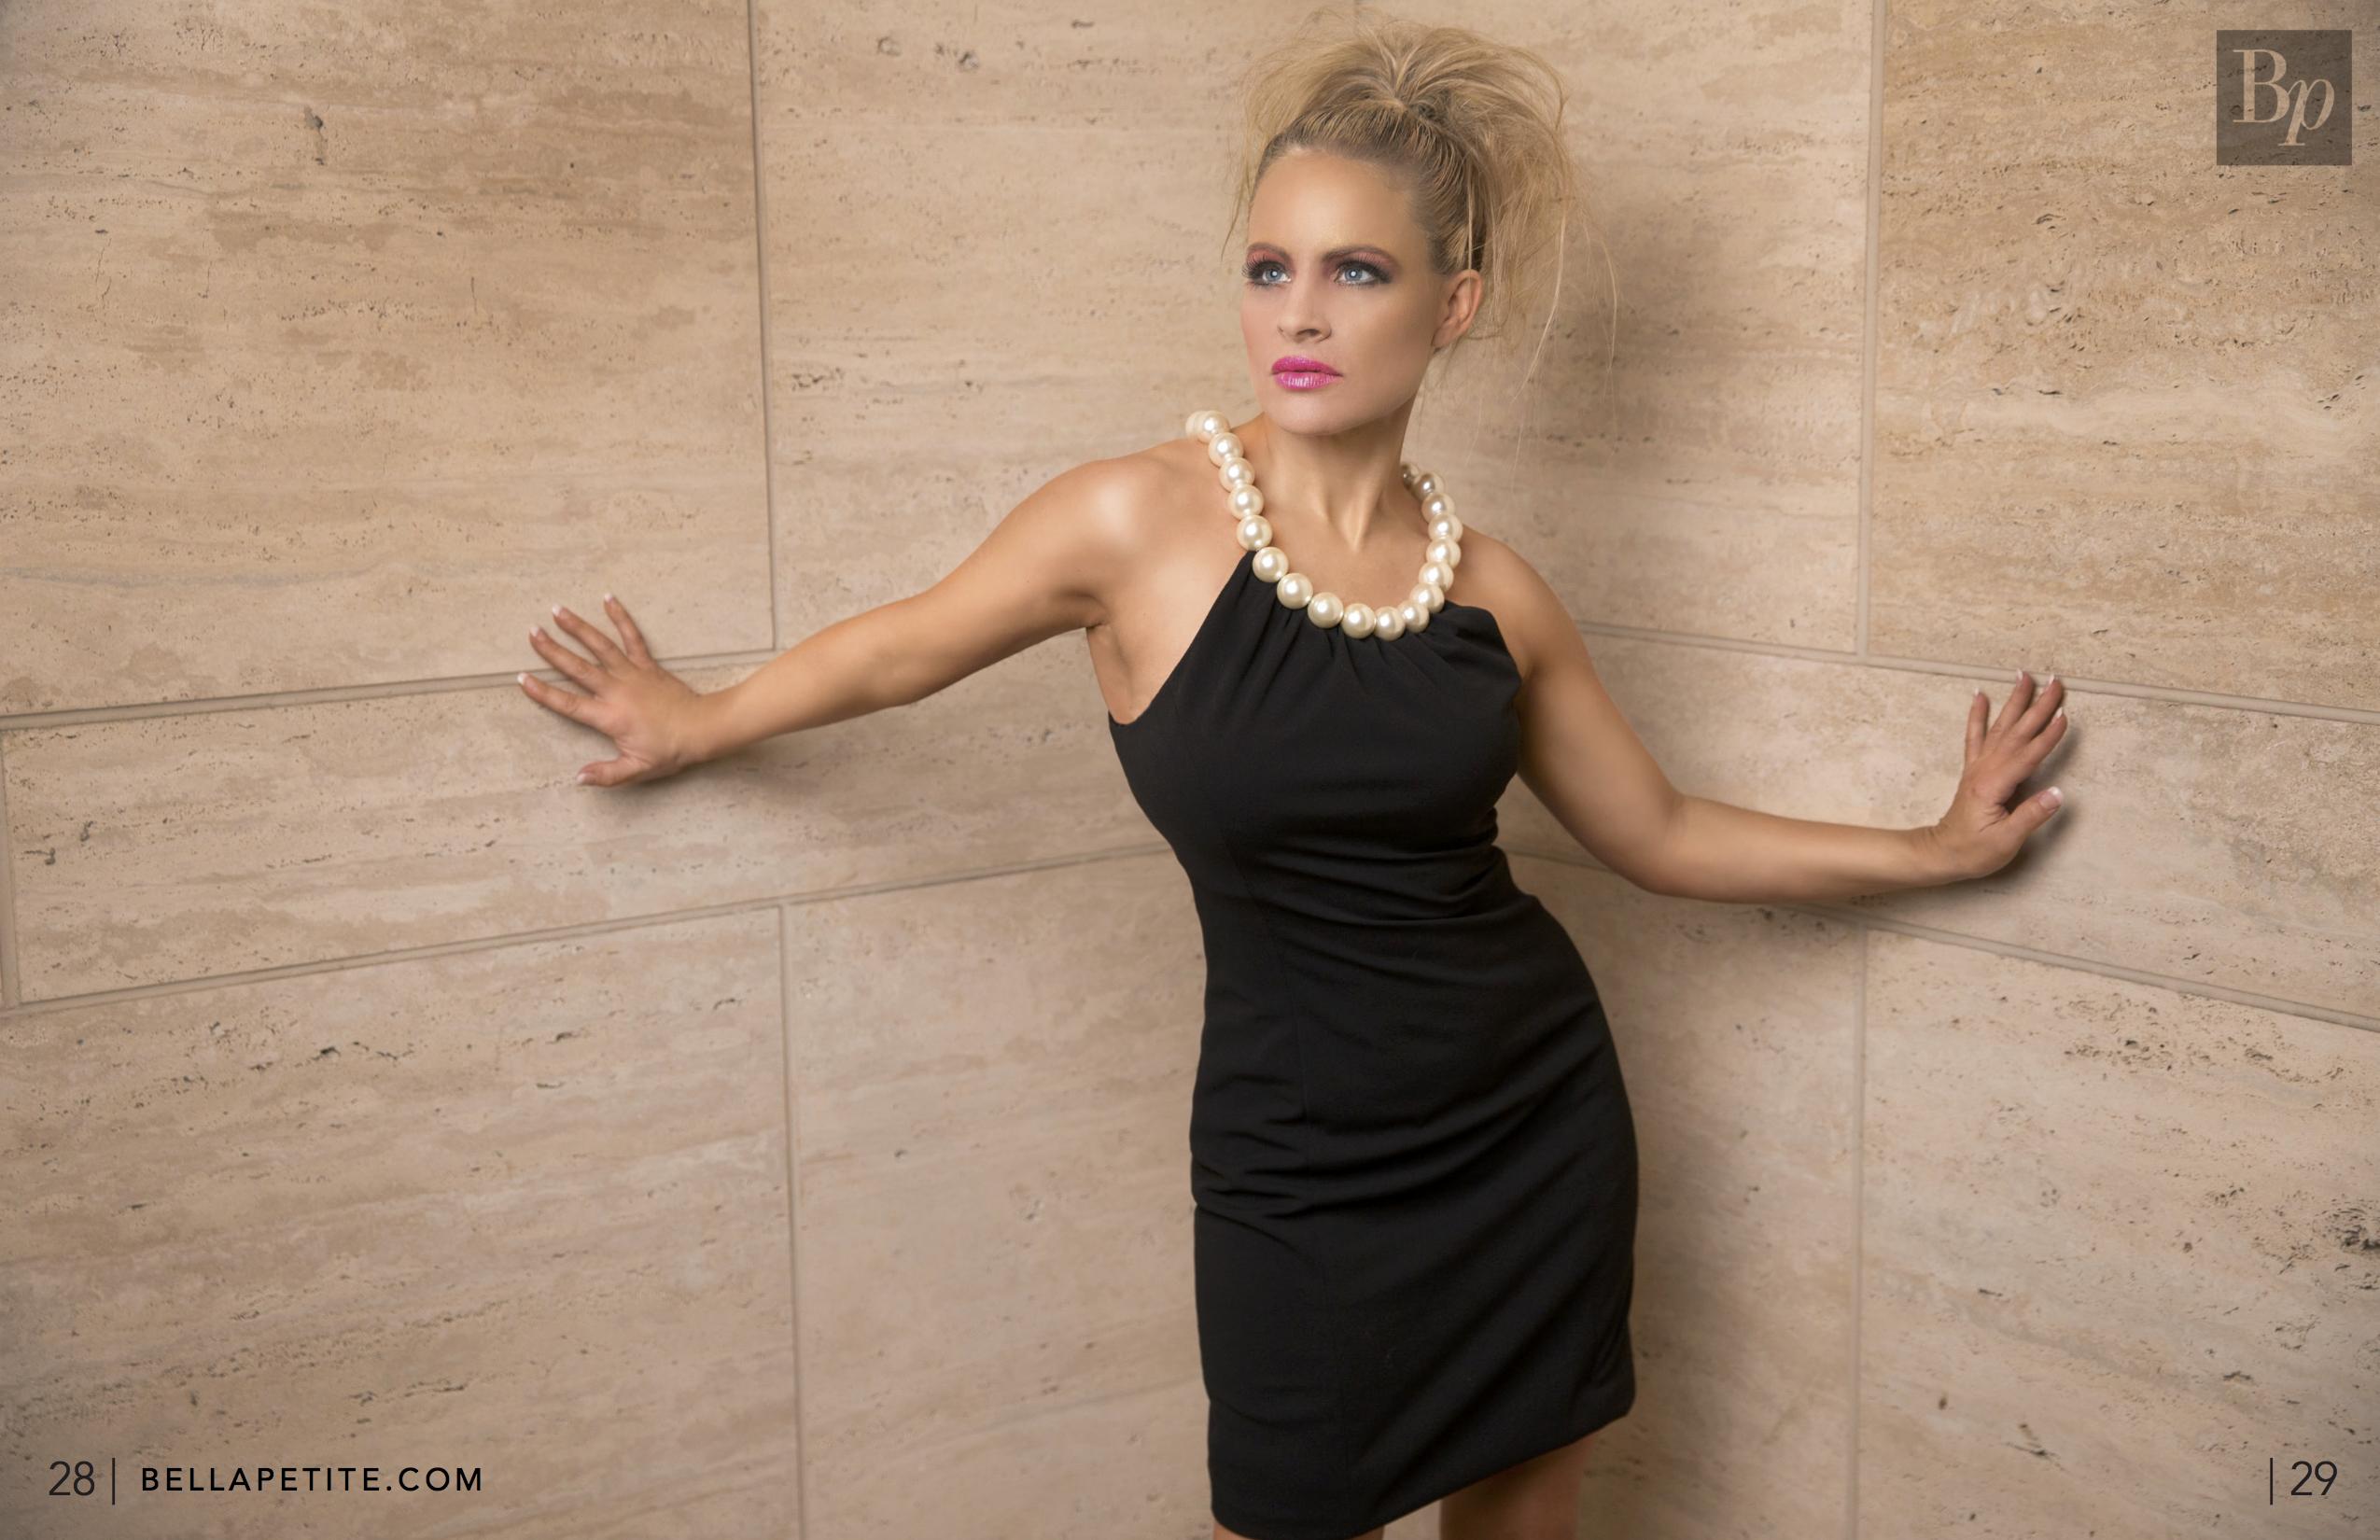 Ann Lauren ® fashion dolls model actress imdb